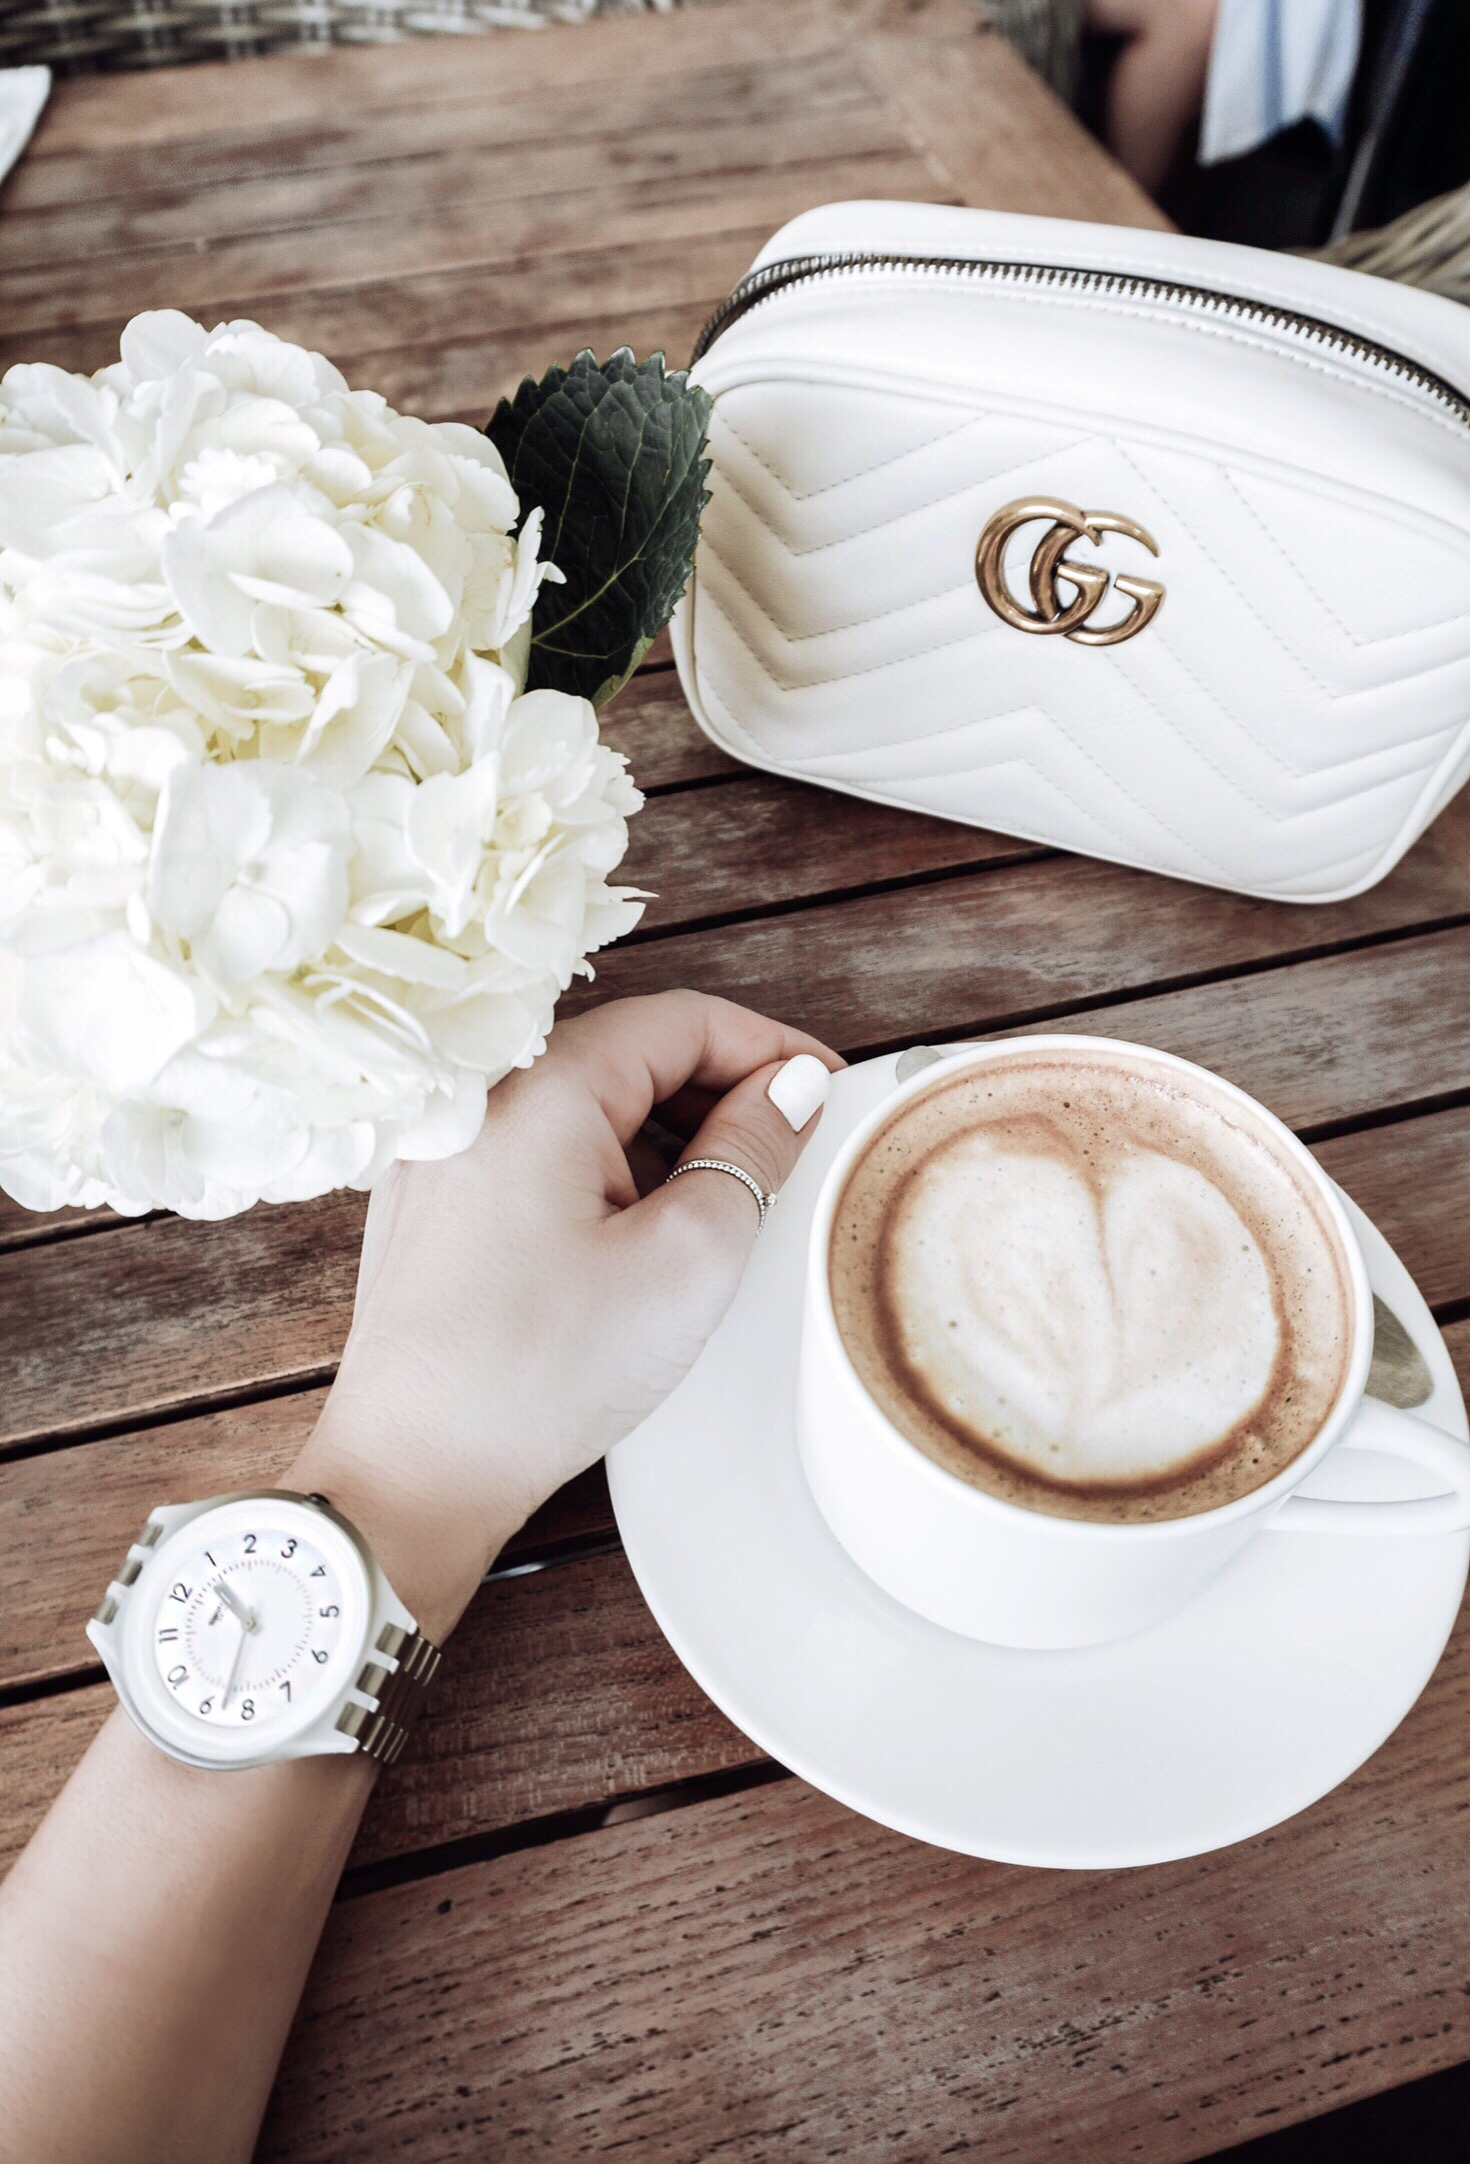 Tiffany Jais Houston fashion and lifestyle blogger of Flaunt and Center | Houston fashion blogger 2017 summer fashion trends | Coffee flatlay, flatlay